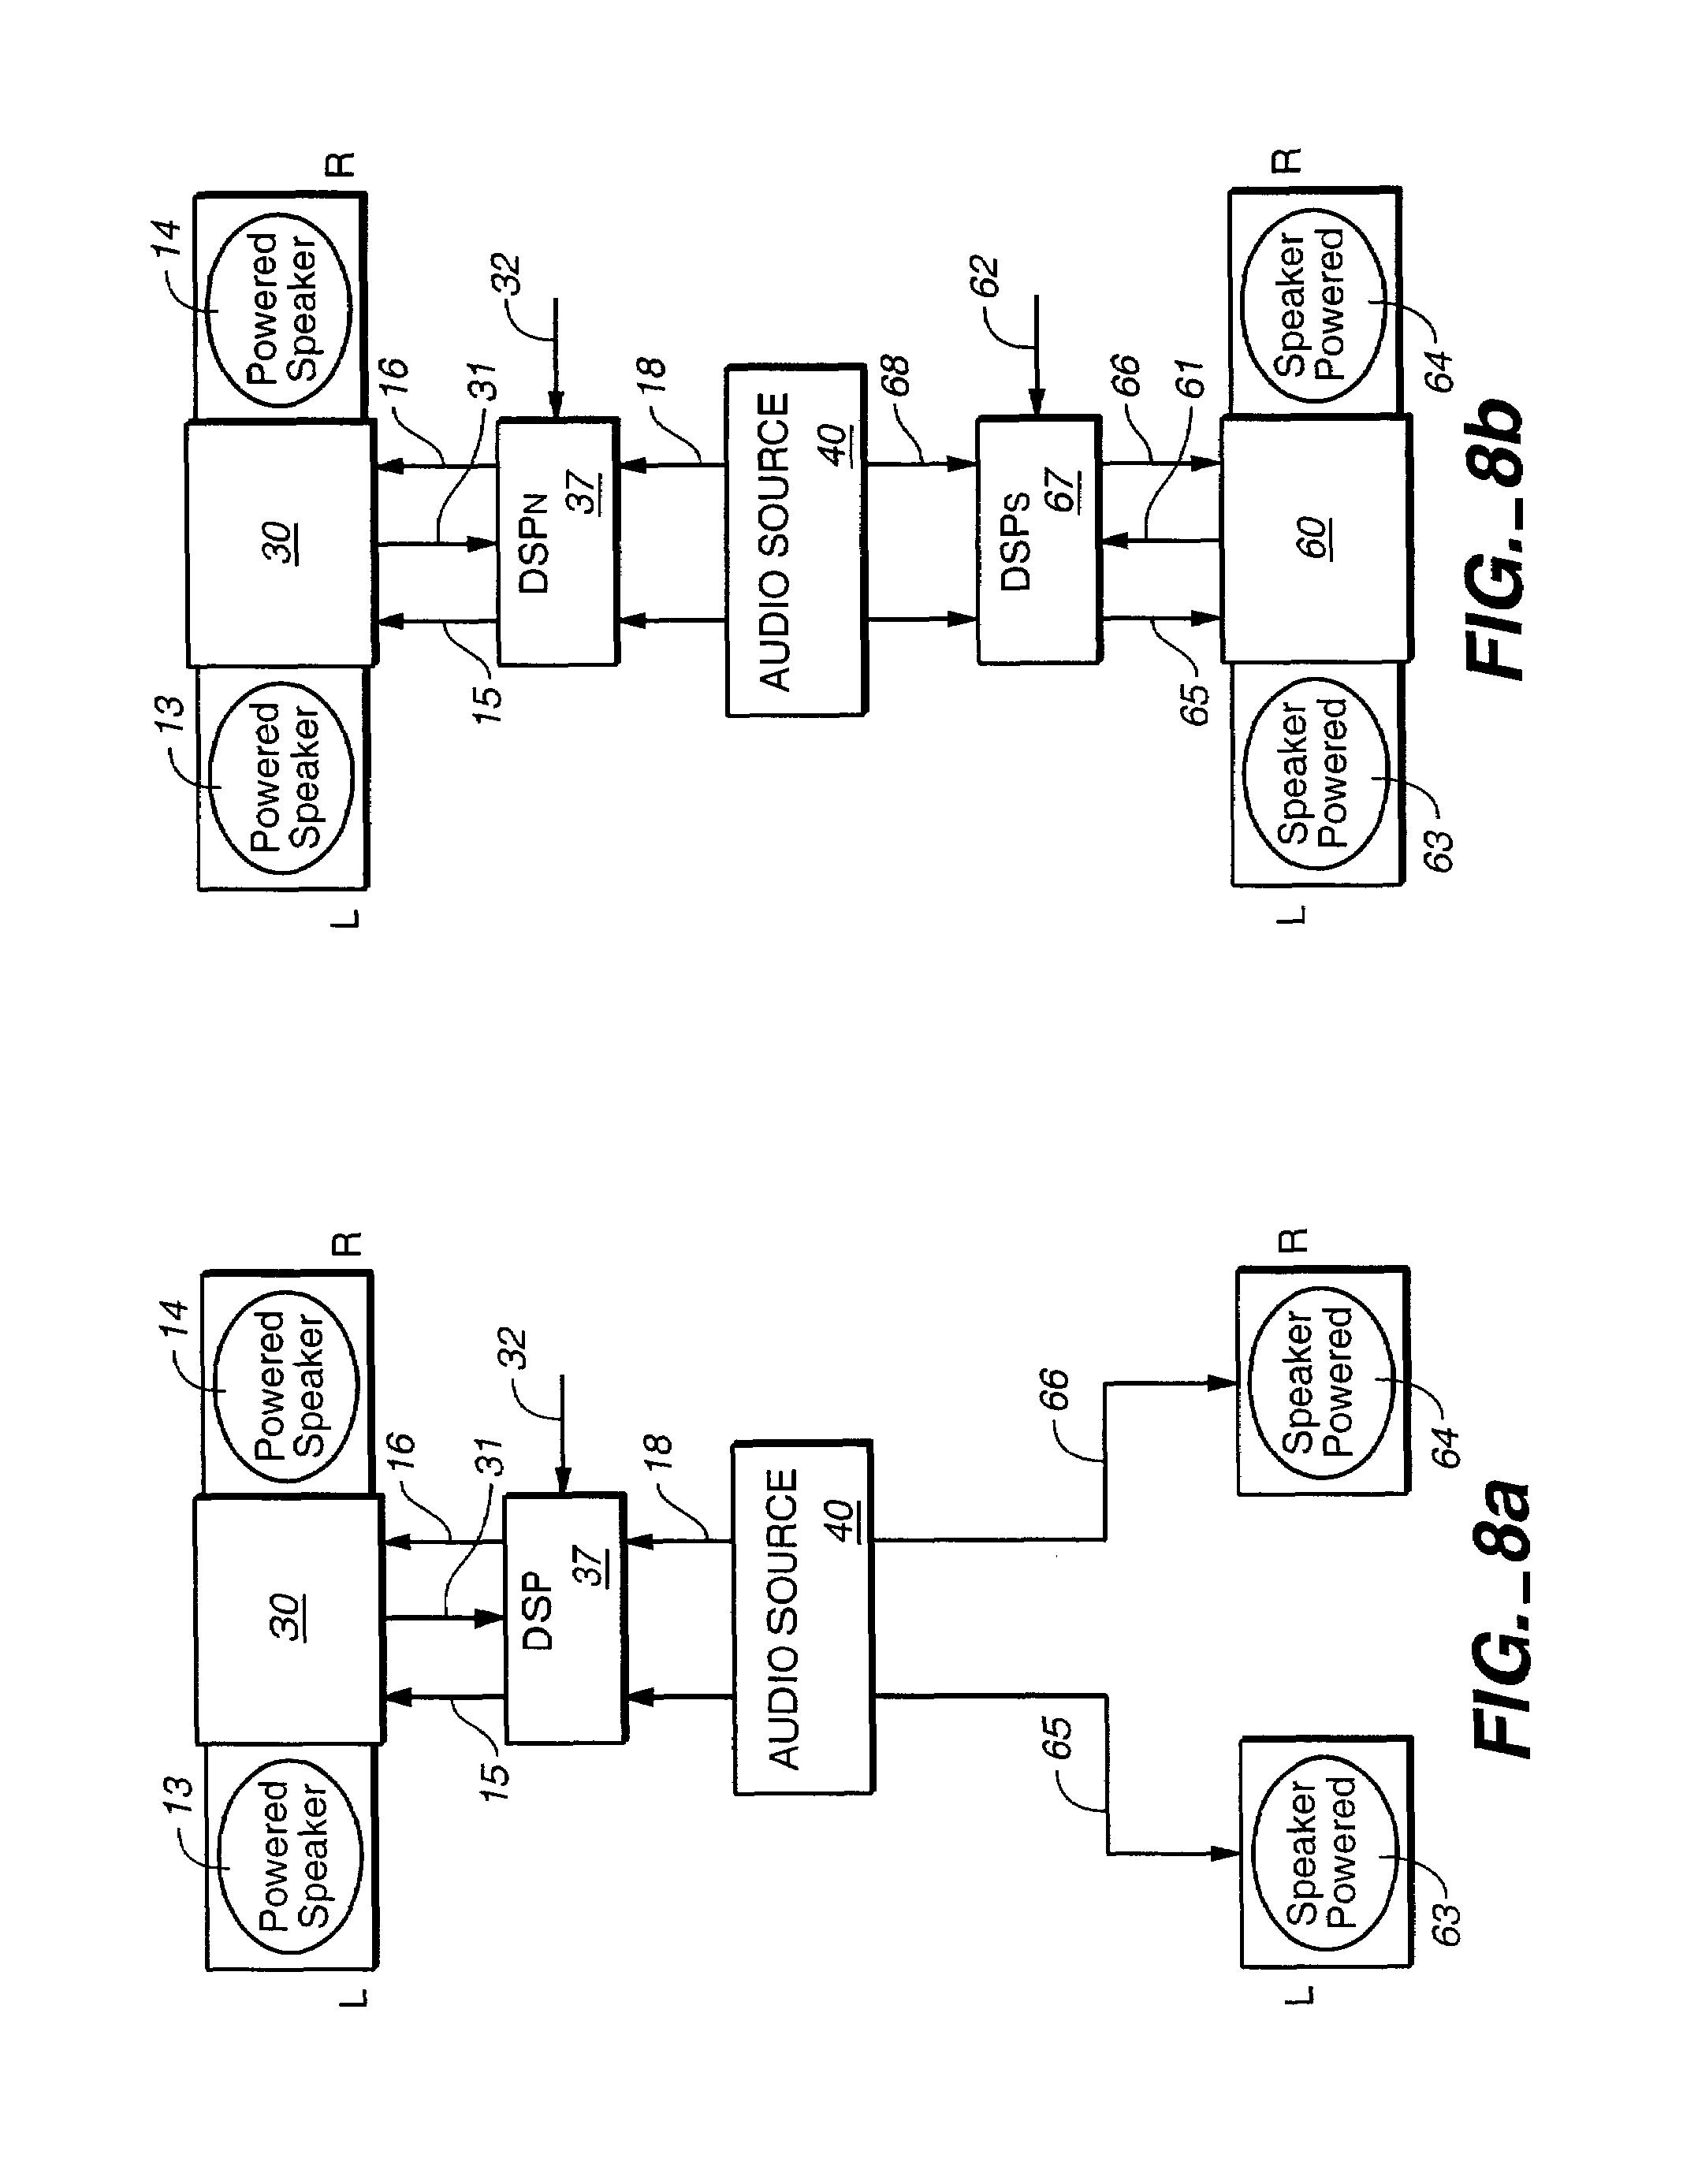 dodge omni stereo wiring diagram  dodge  get free image